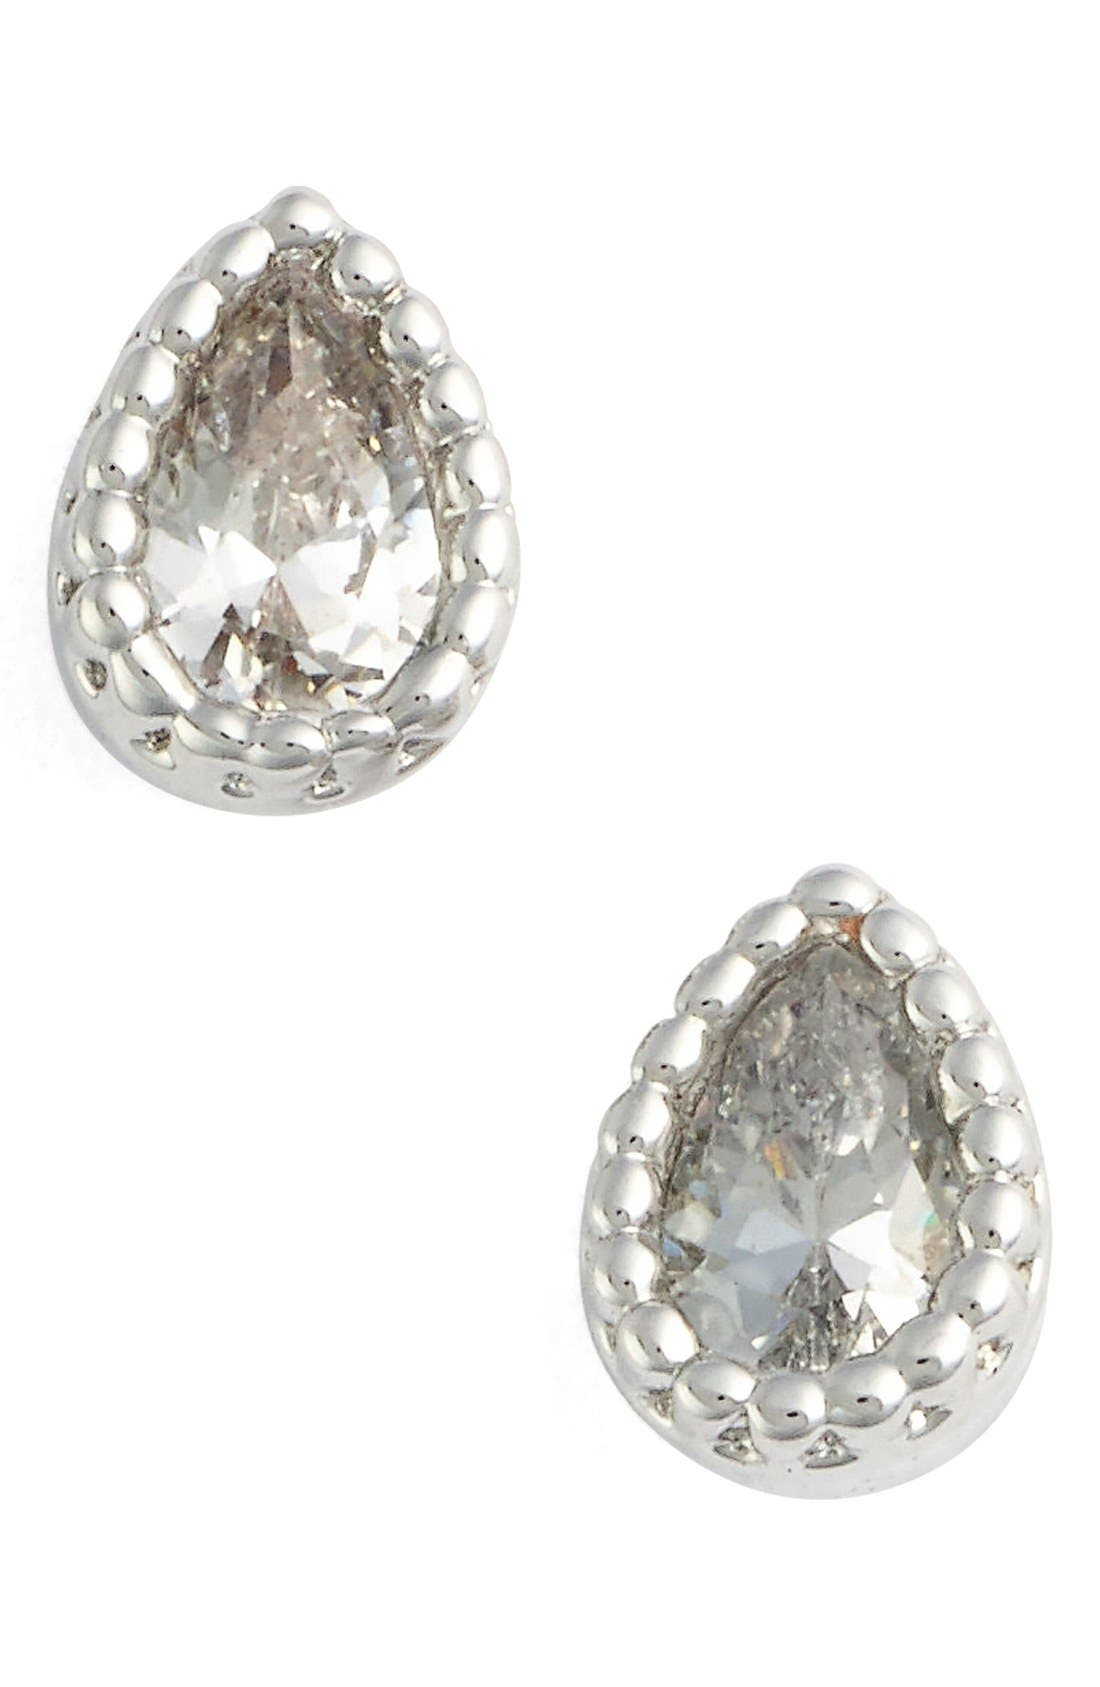 Micro Teardrop Stud Earrings,                             Main thumbnail 1, color,                             040